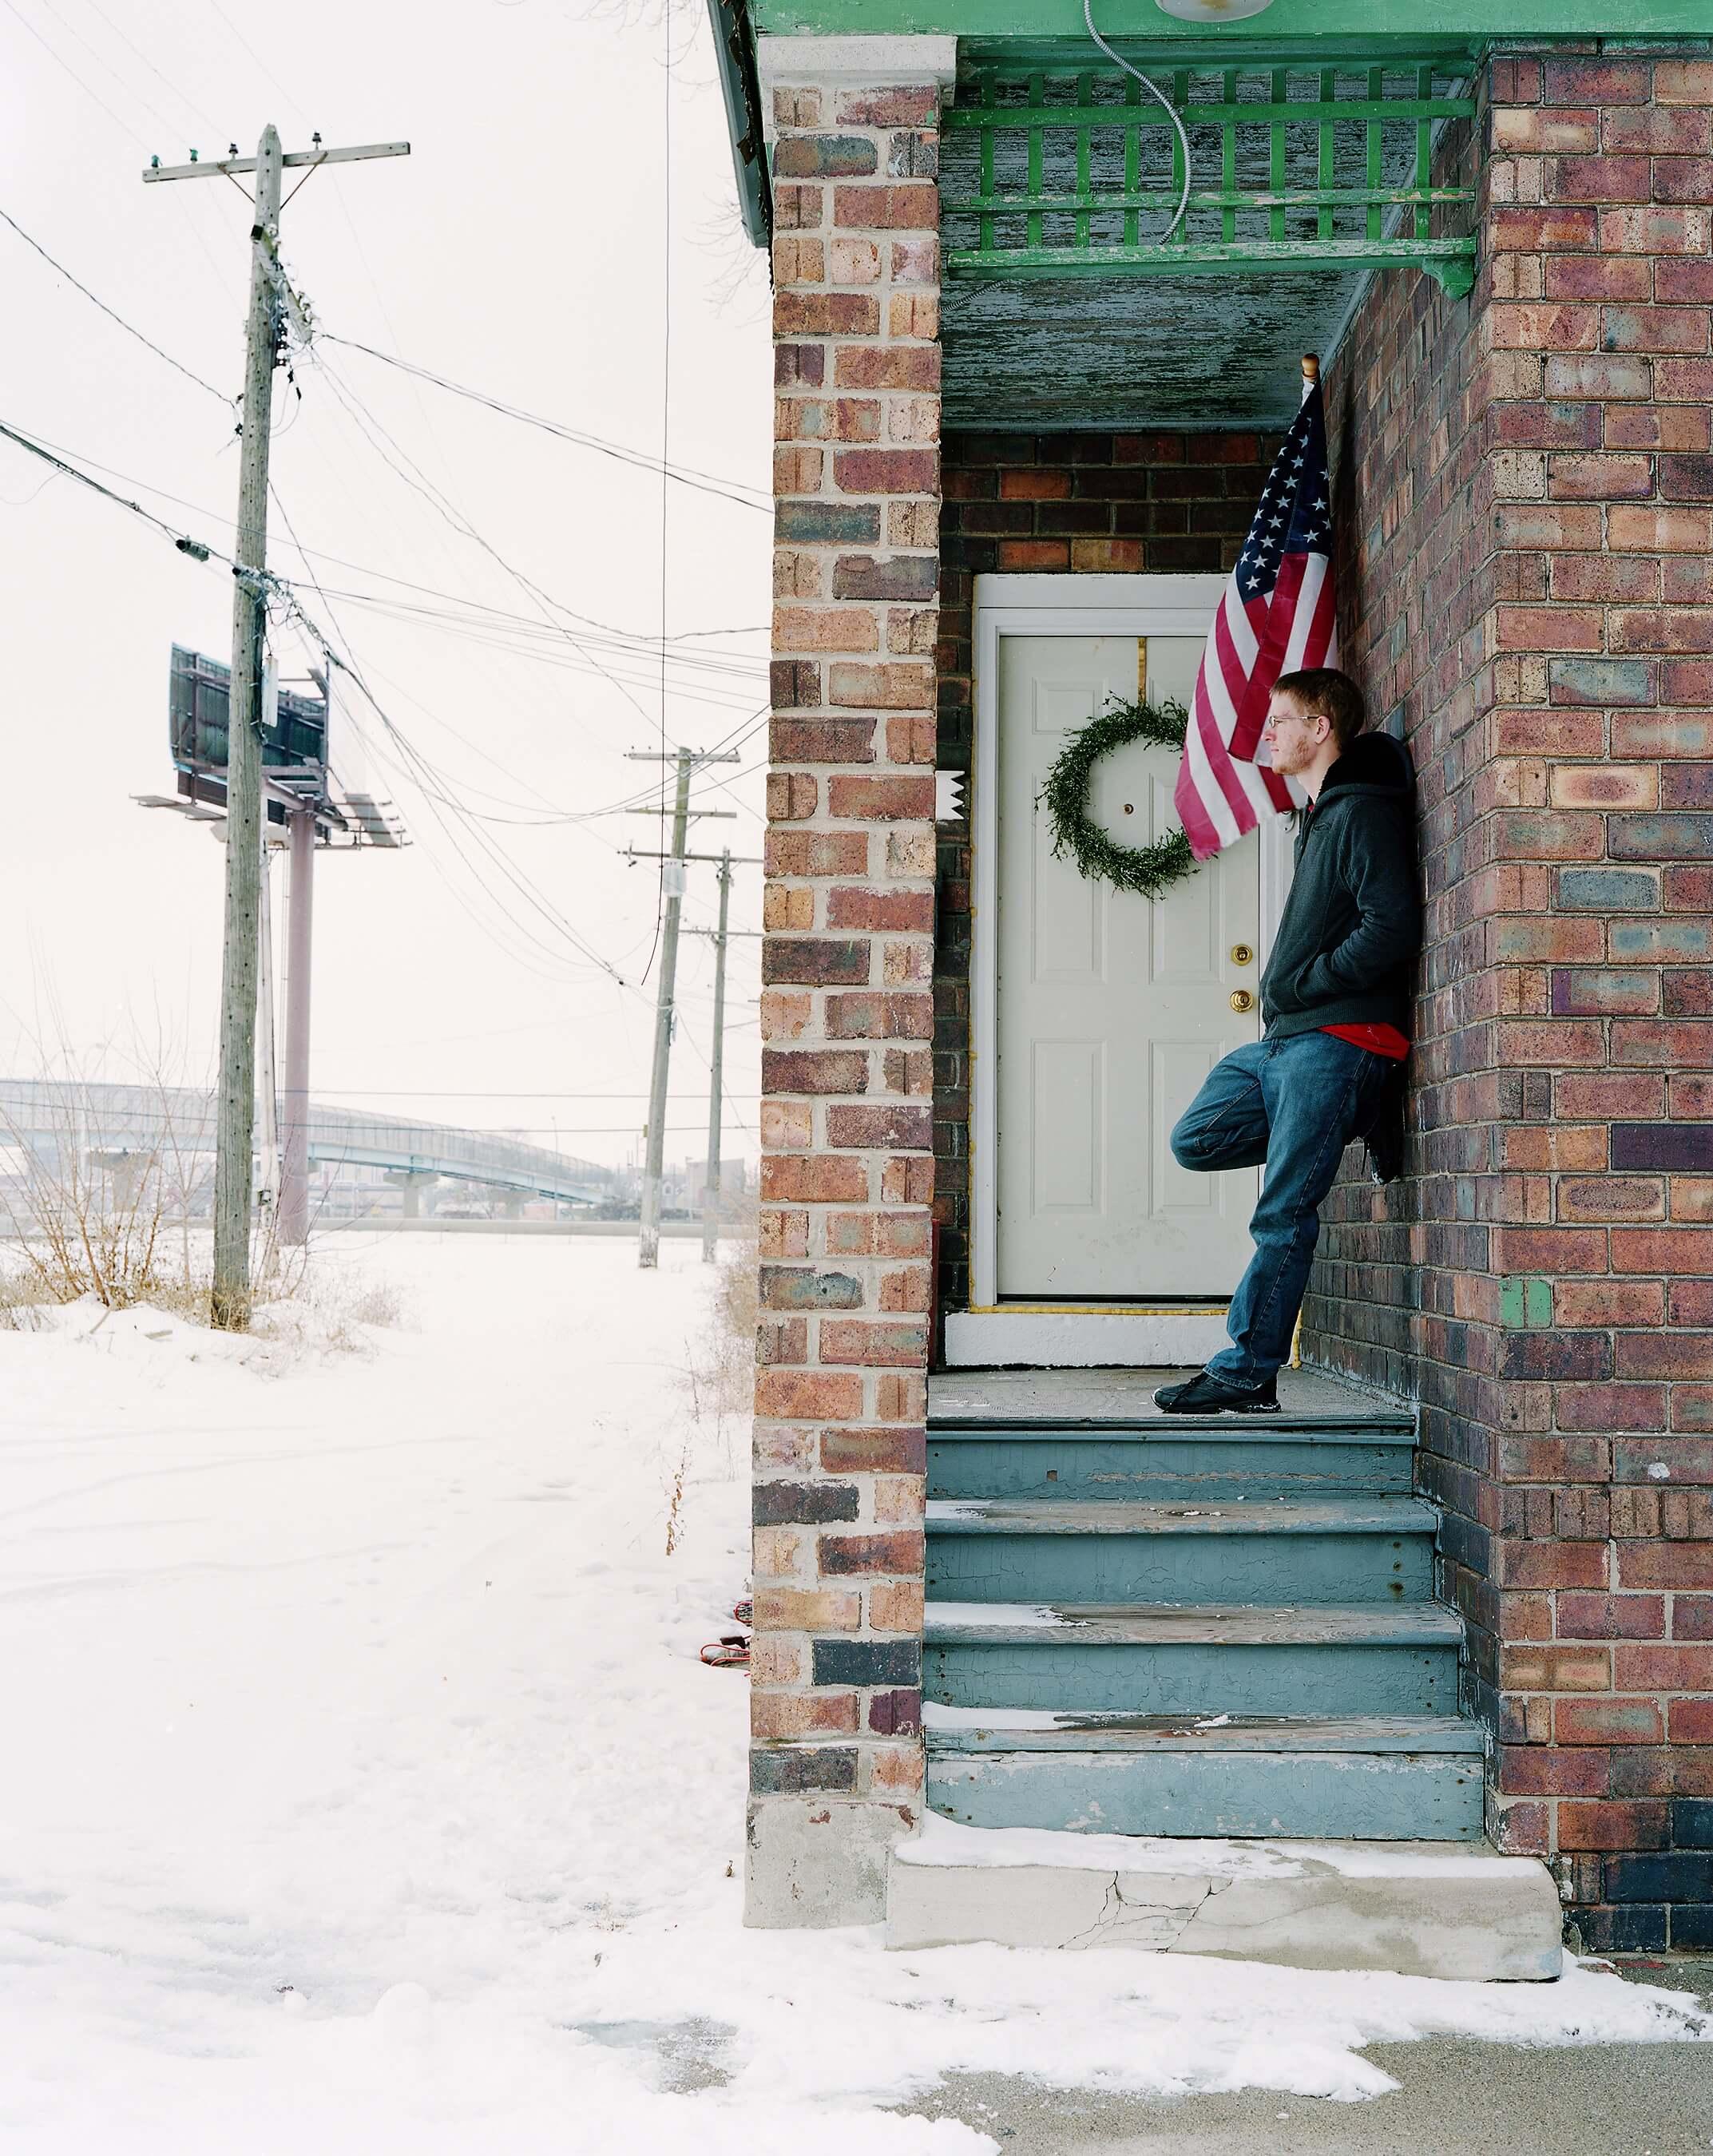 New Years Day, Detroit, MI, 2011 by Daniel Farnum